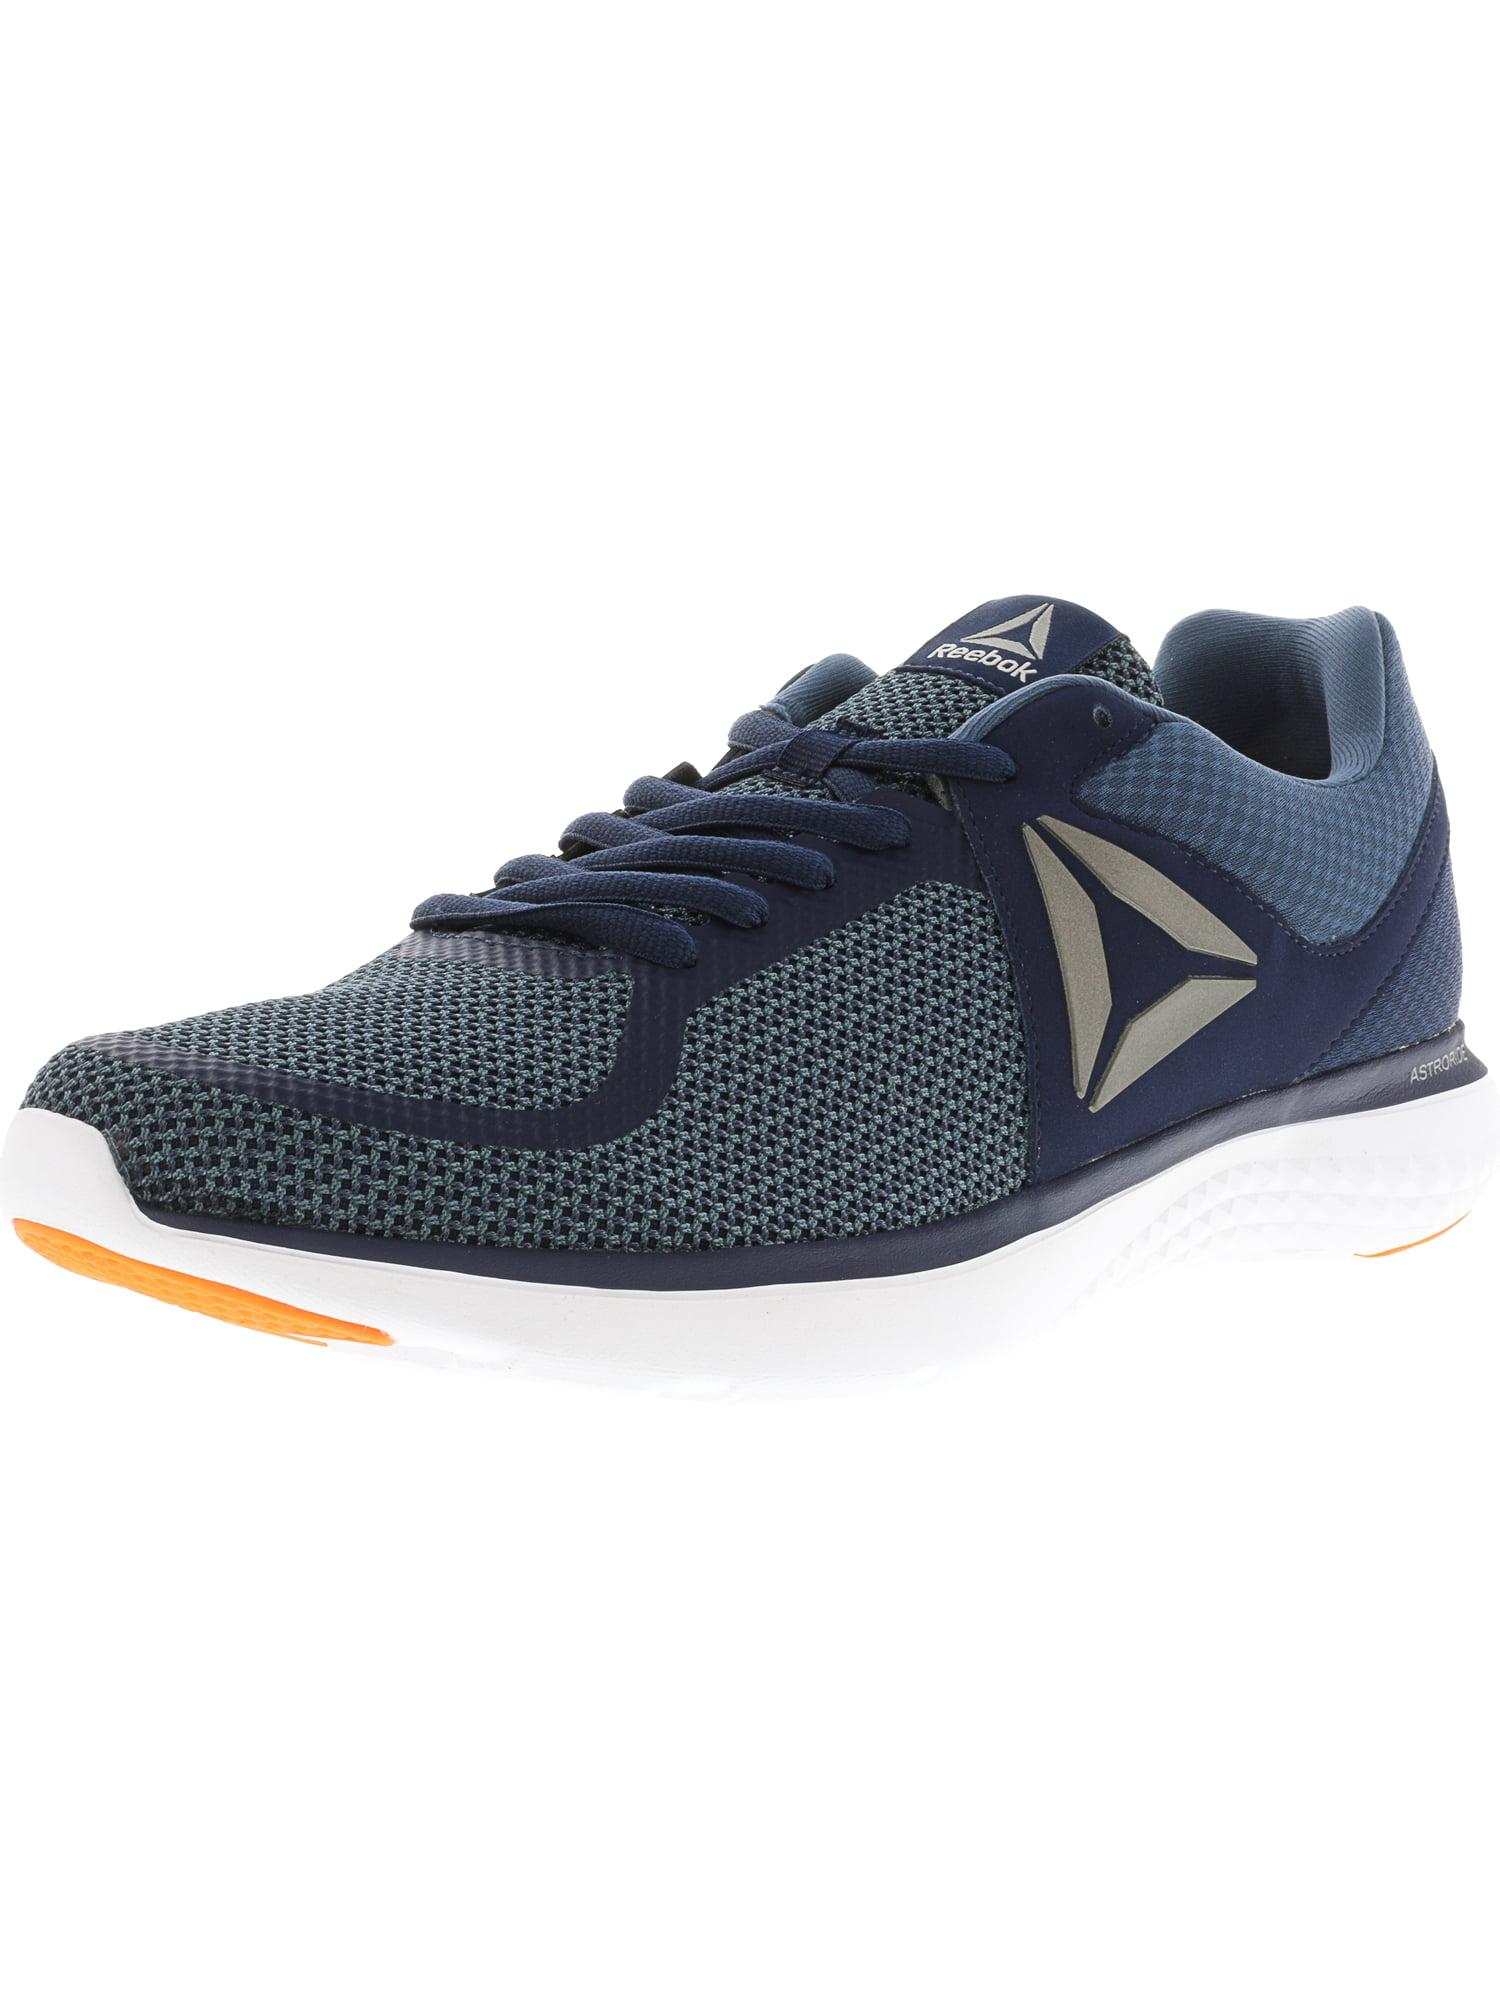 eaa194072fcee5 Reebok Men s Astroride Run Mt Navy   Blue White Orange Ankle-High Running  Shoe - 14M